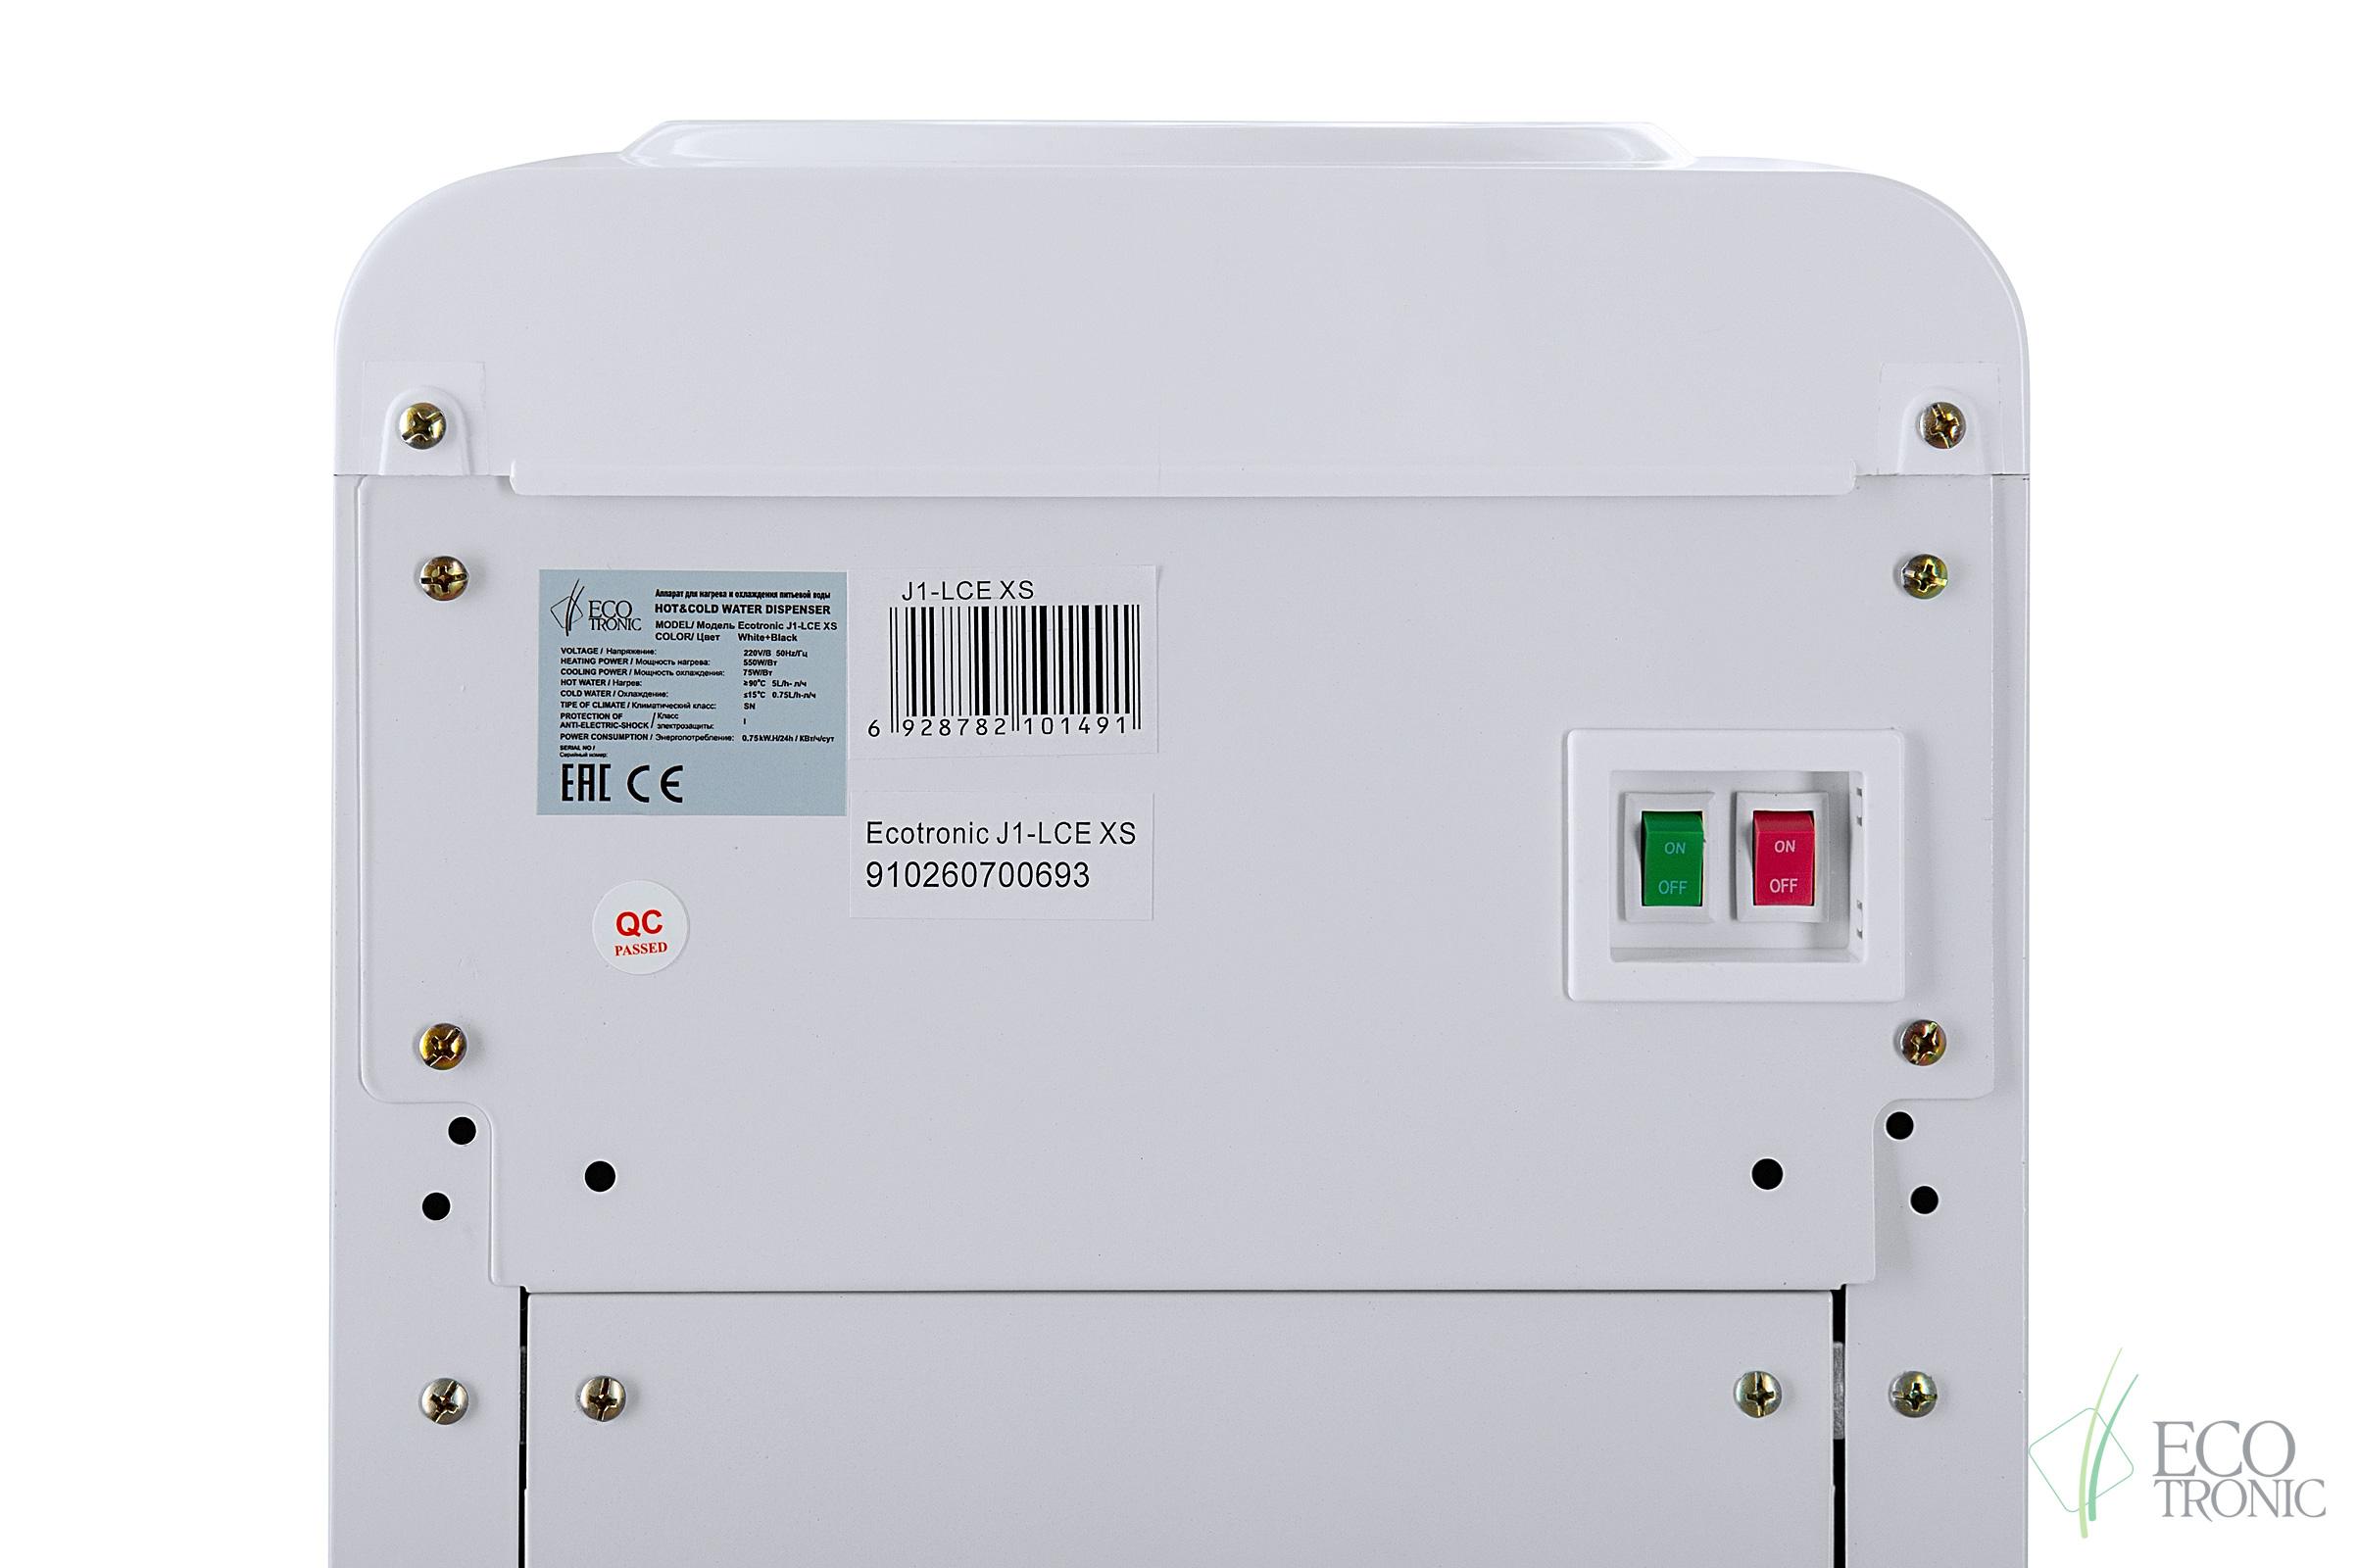 Кулер c нагревом и охлаждением Ecotronic J1-LCE XS